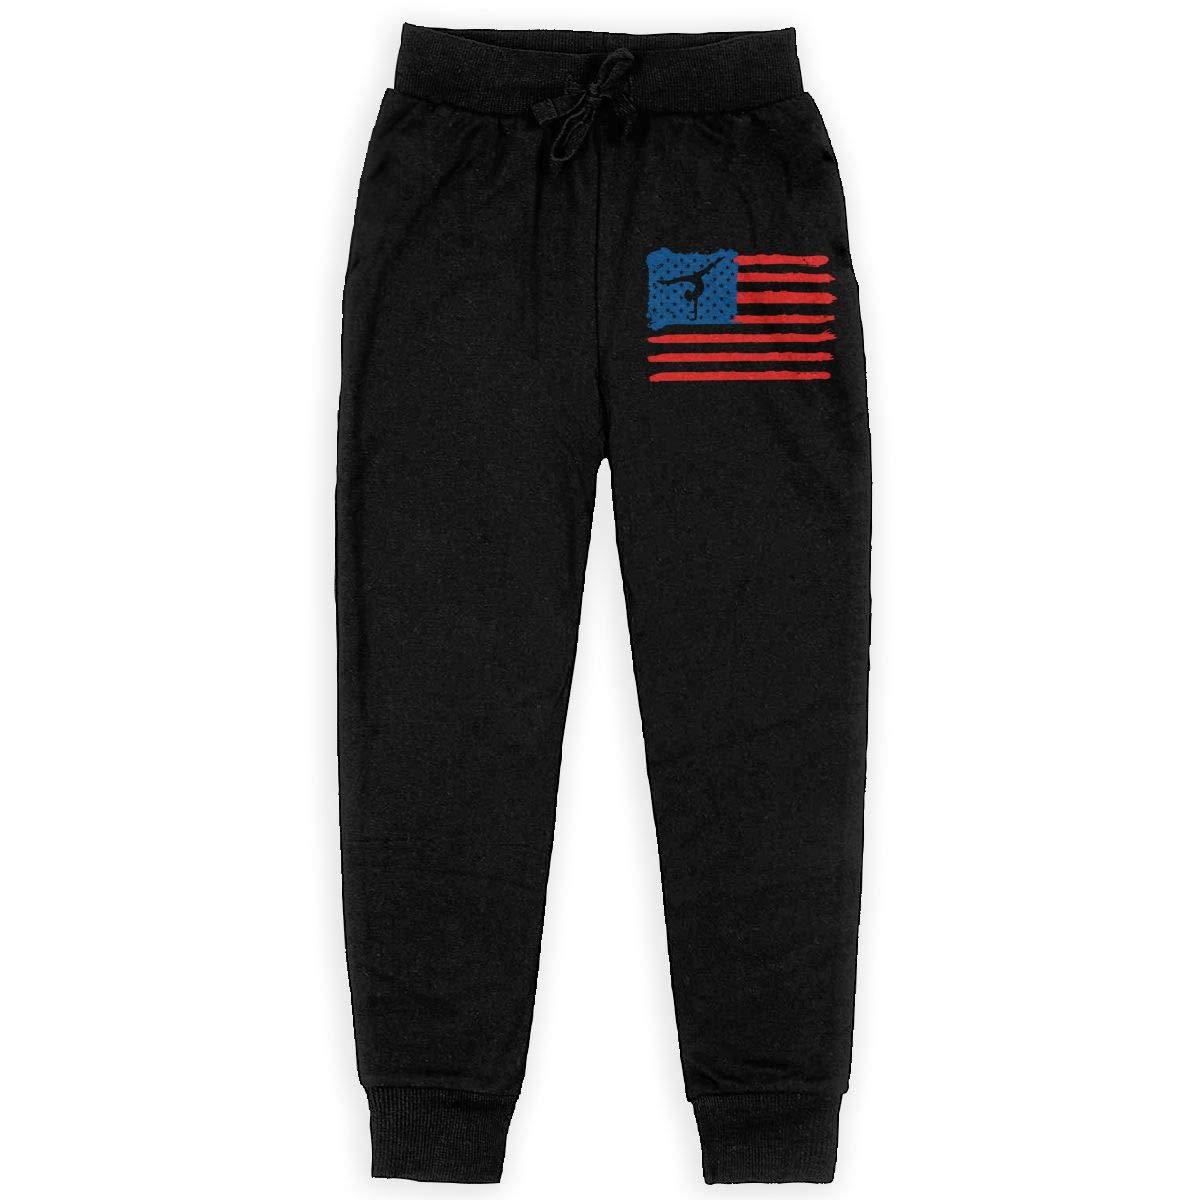 Girls Sweat Pant for Teenager Boys WYZVK22 American Flag Gymnastics Soft//Cozy Sweatpants